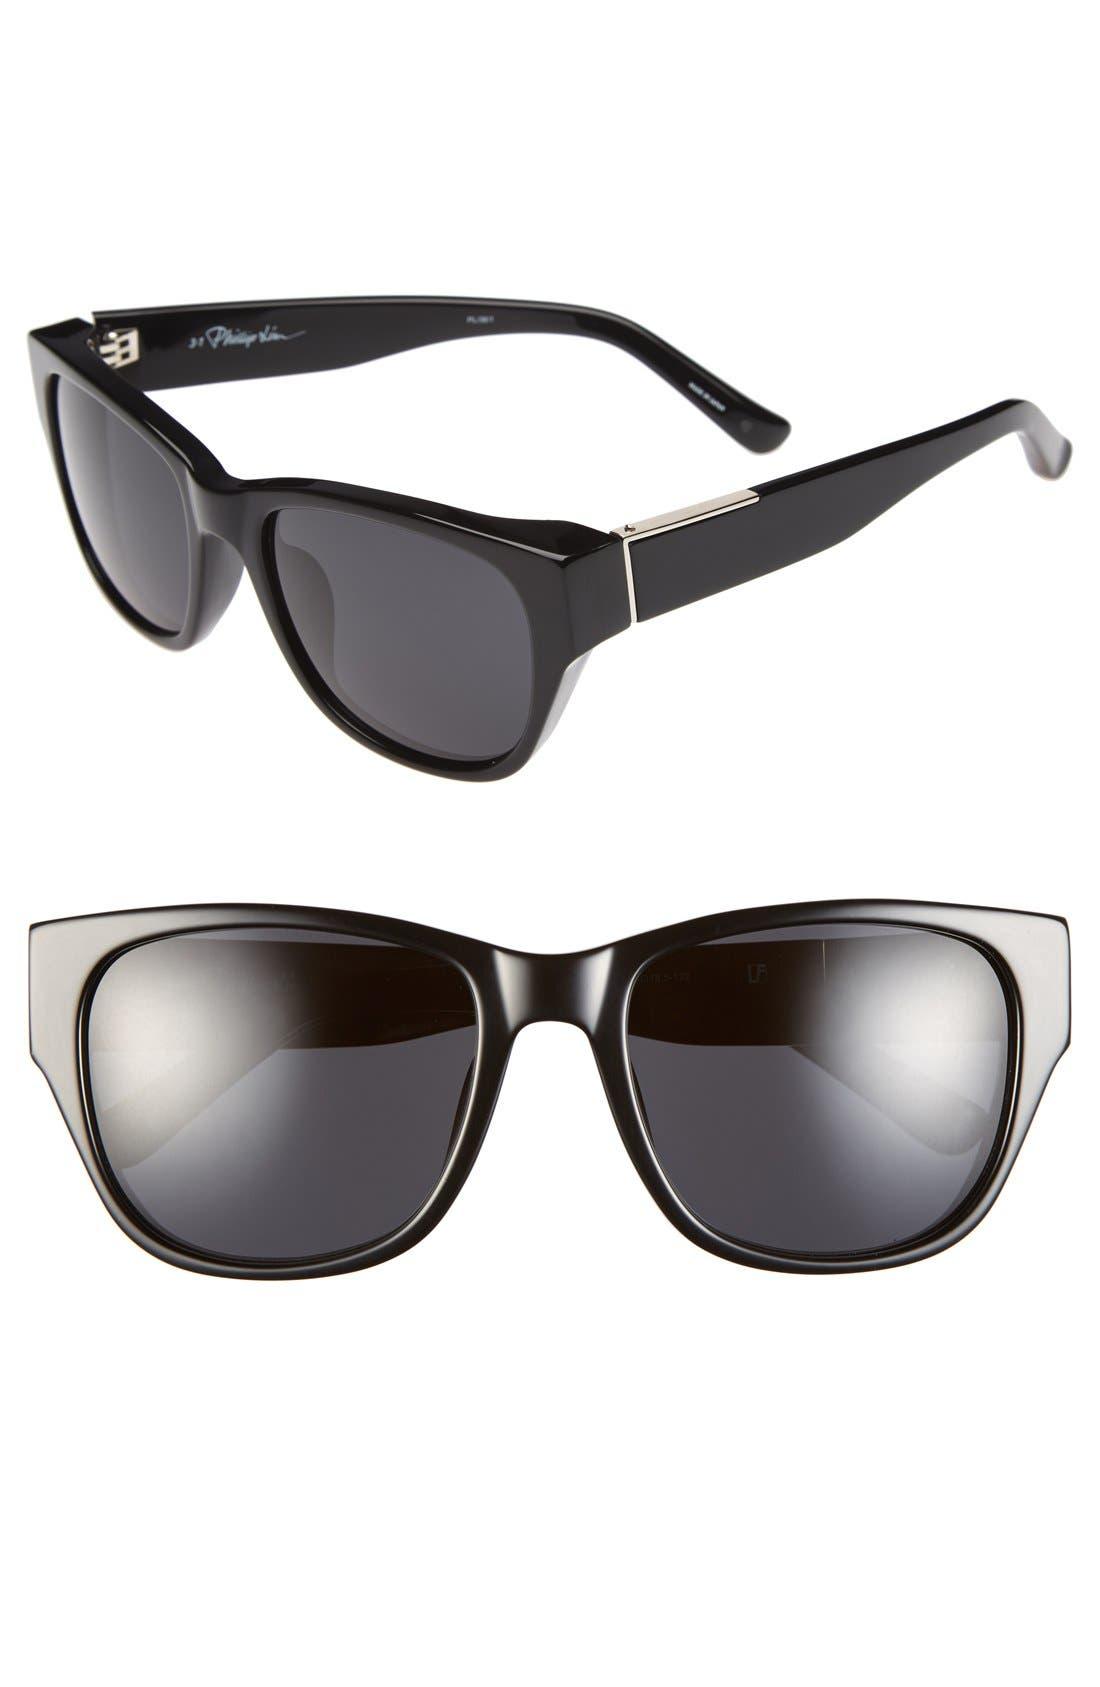 Alternate Image 1 Selected - 3.1 Phillip Lim 54mm Sunglasses